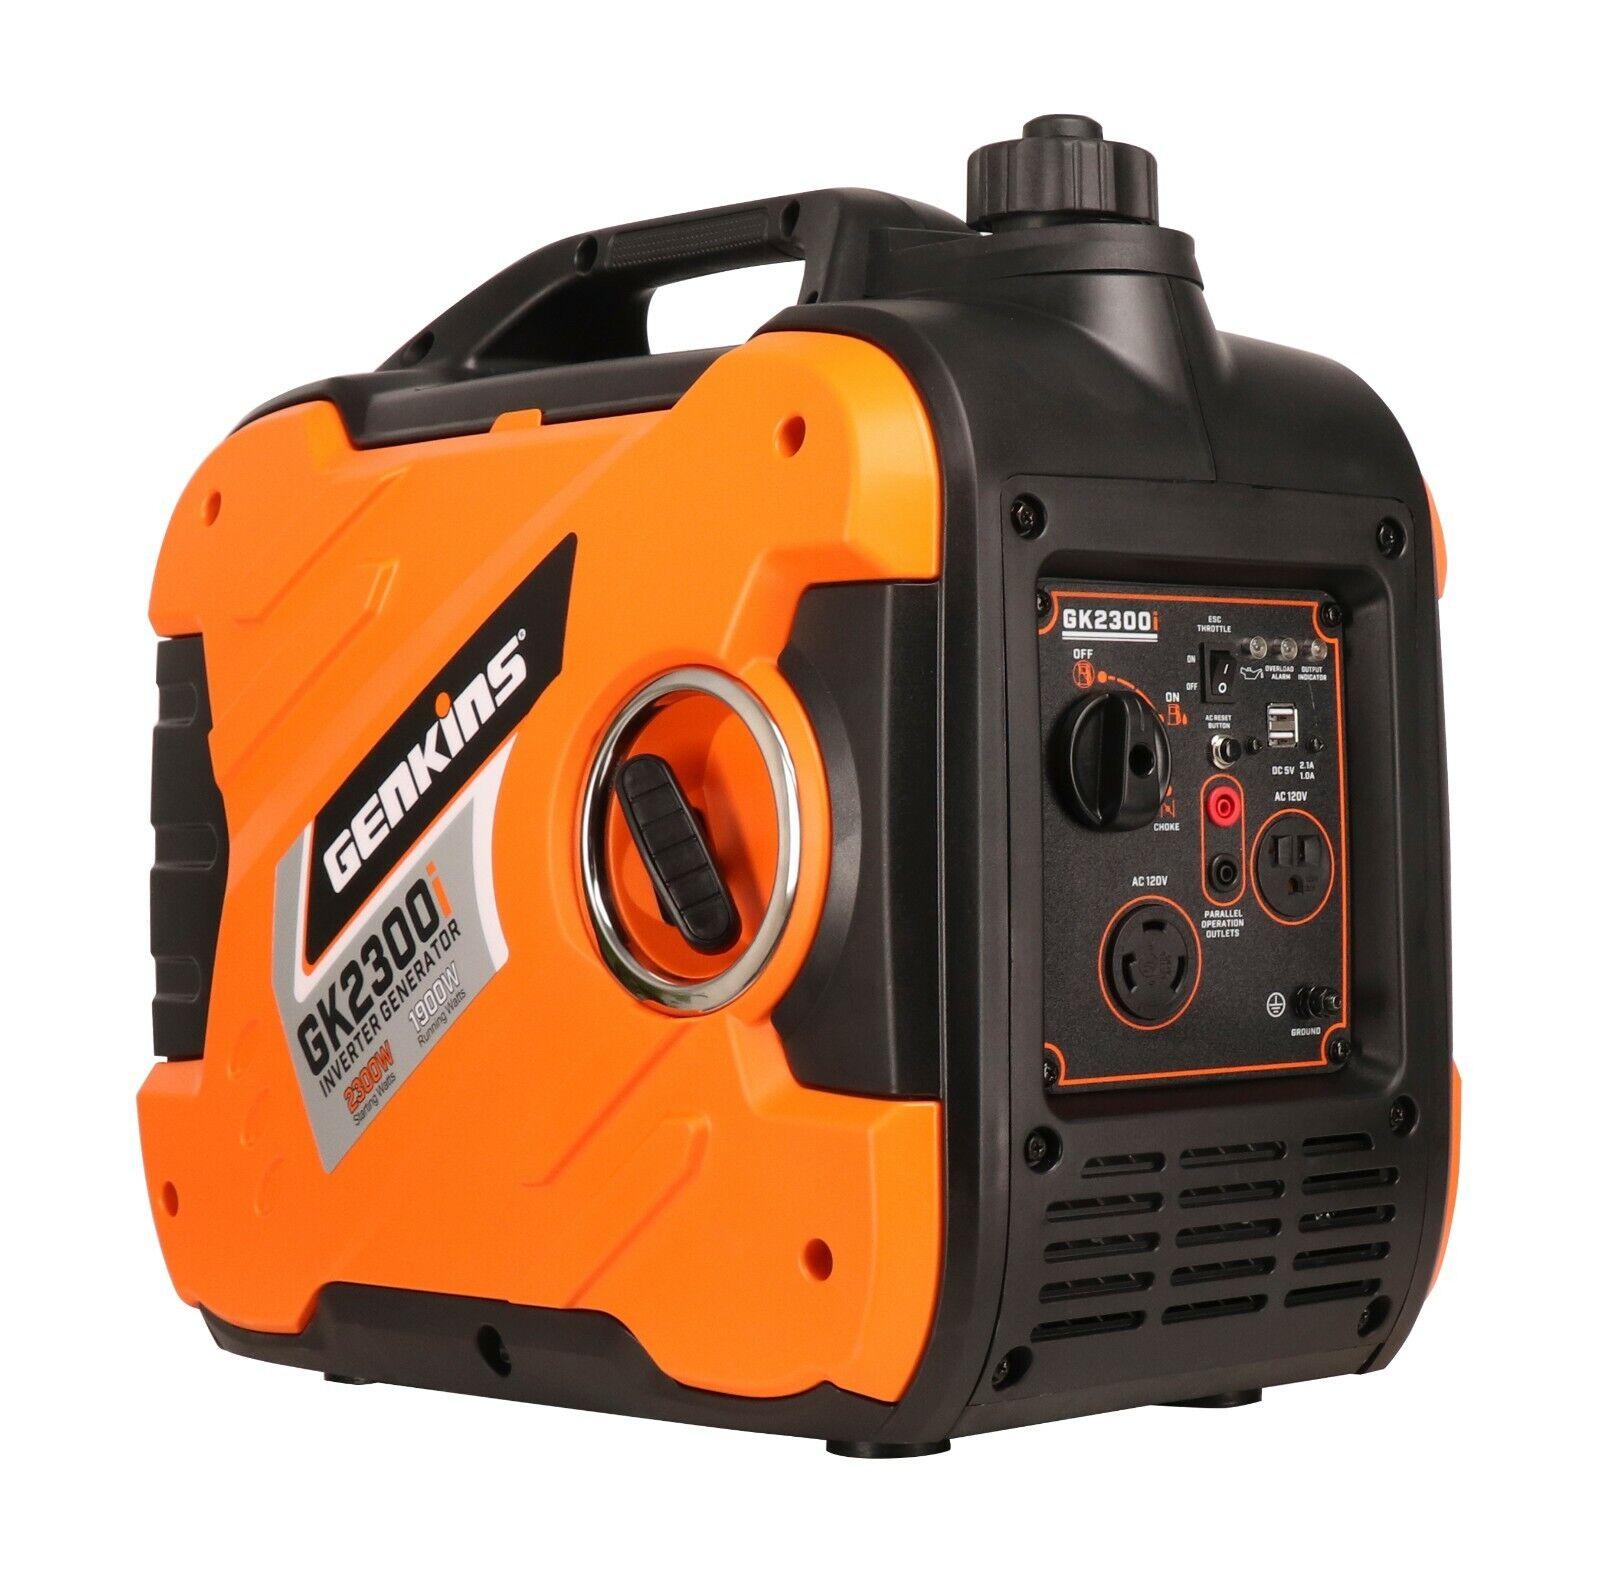 Genkins 2300 Watt Portable Inverter Generator Gas ...